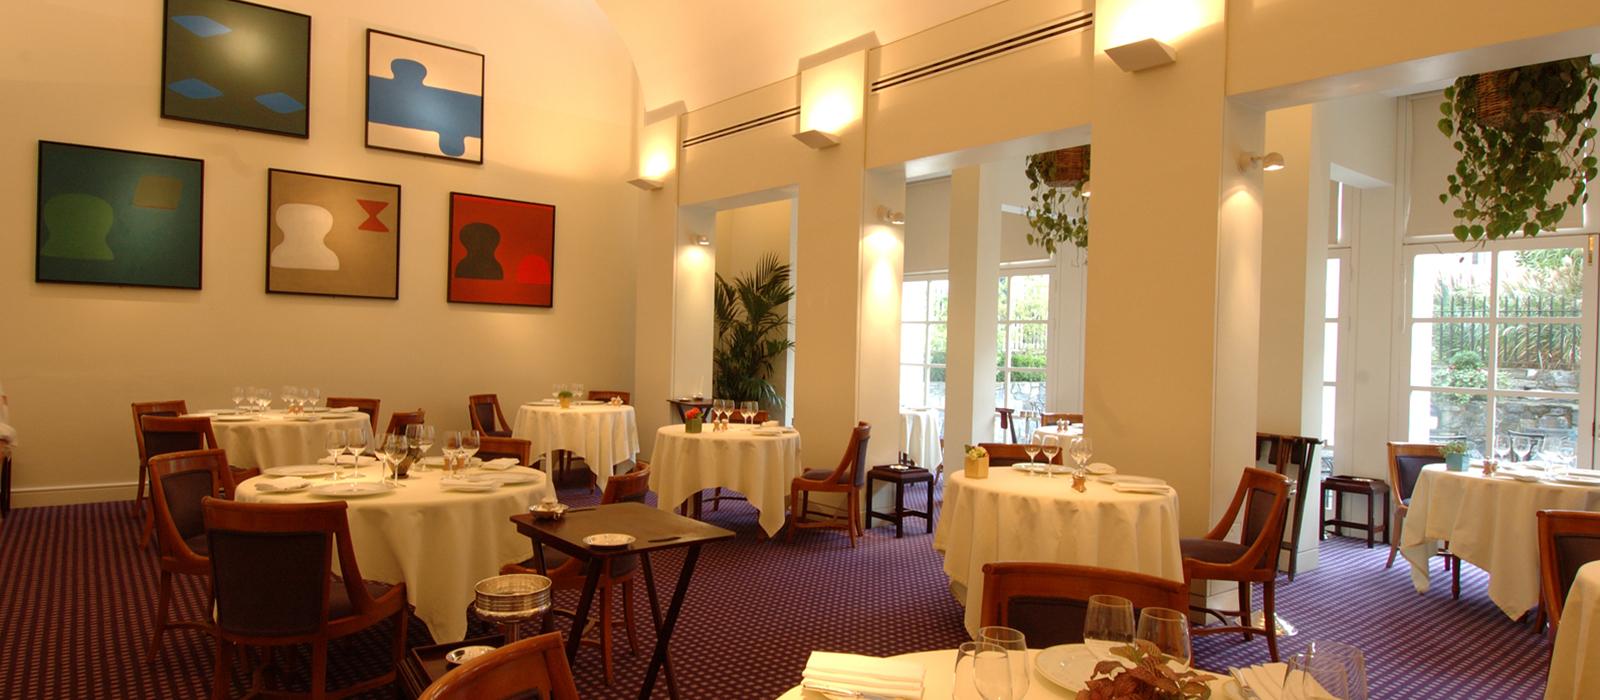 All Star Restaurant Vouchers